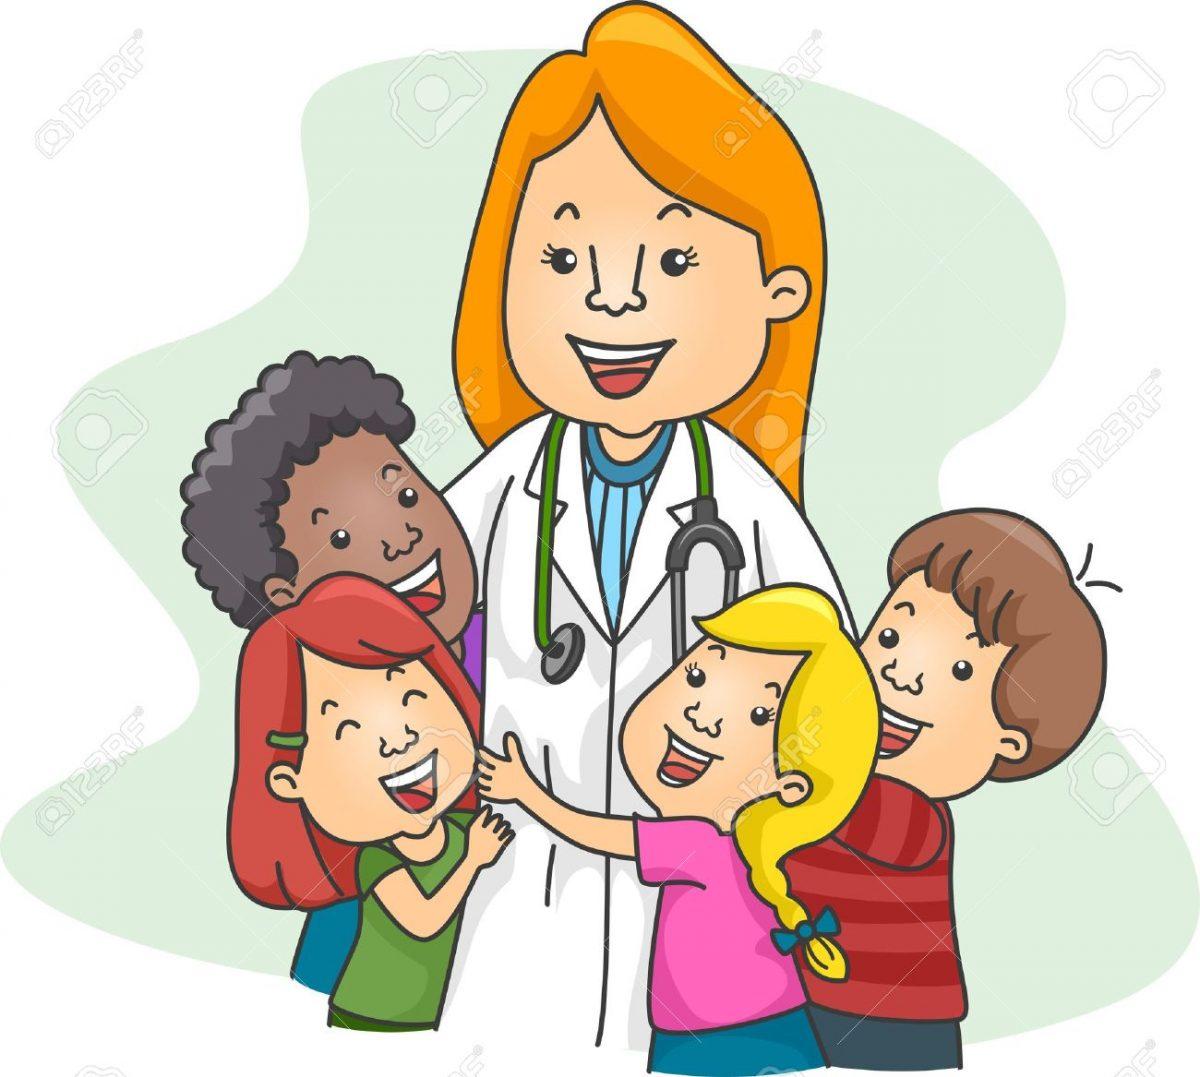 Zdravstvena zaštita i prevencija zdravlja